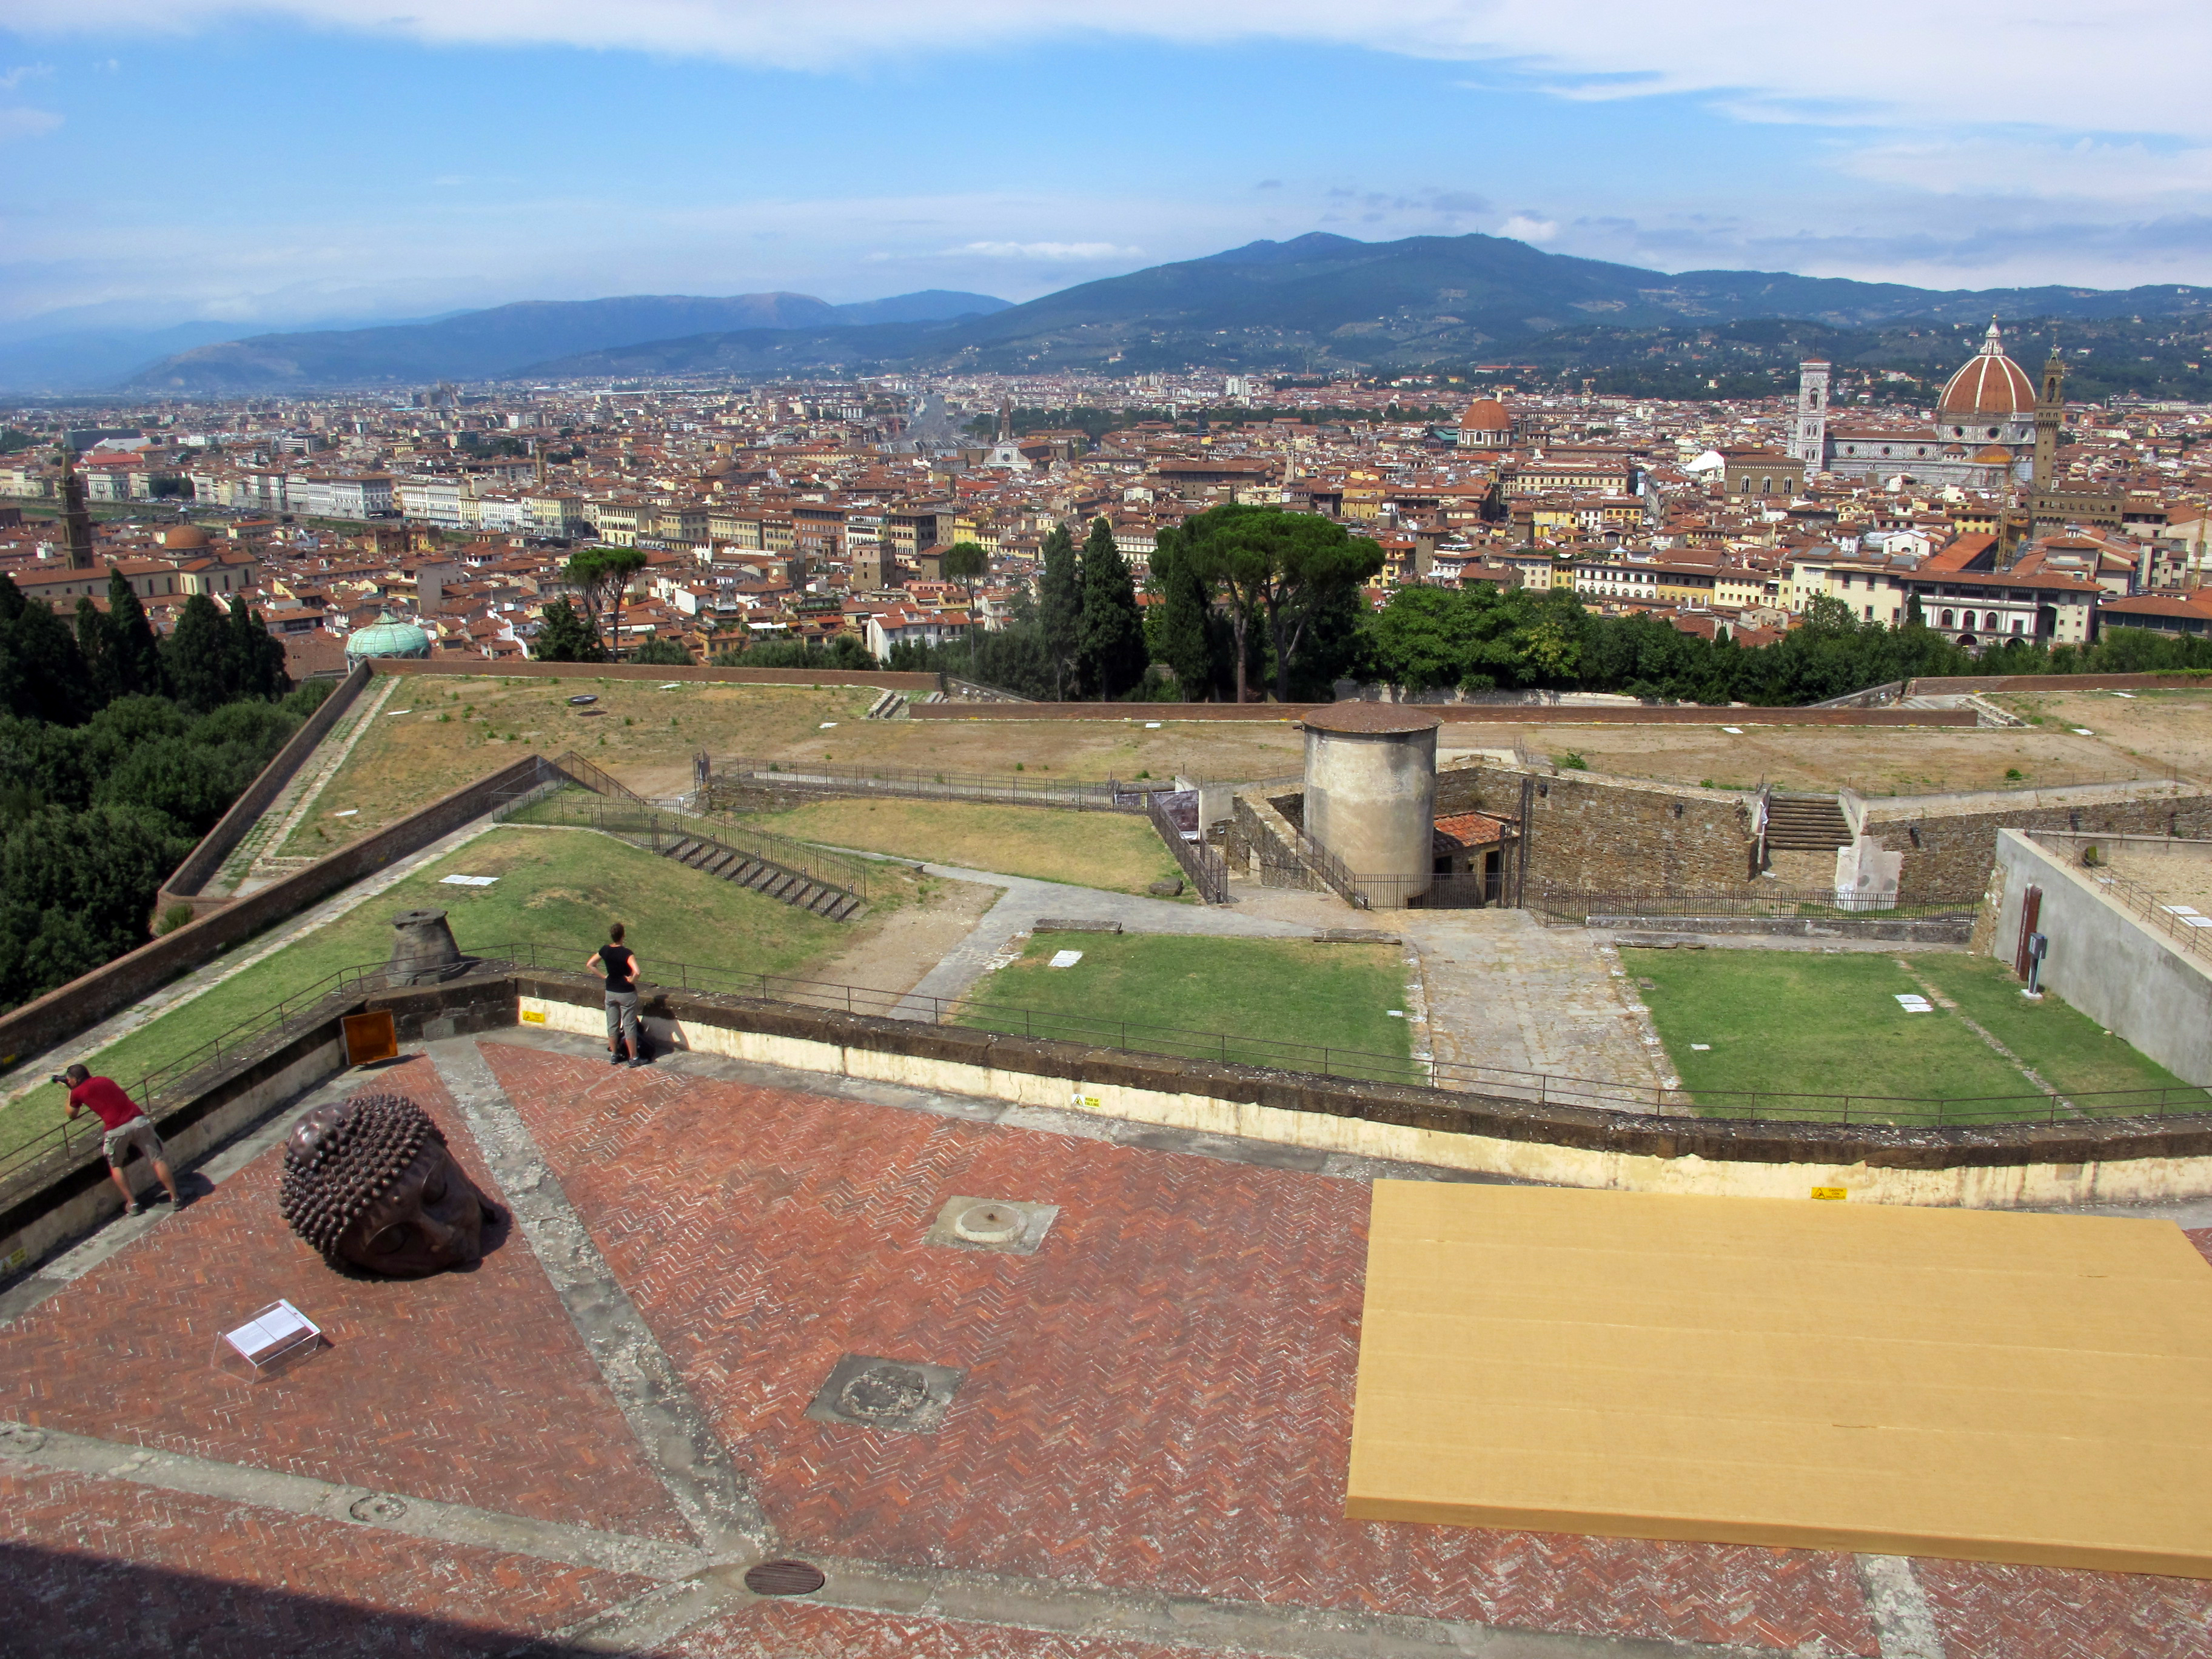 File:Forte belvedere, vista su firenze dalle terrazze 02.JPG ...